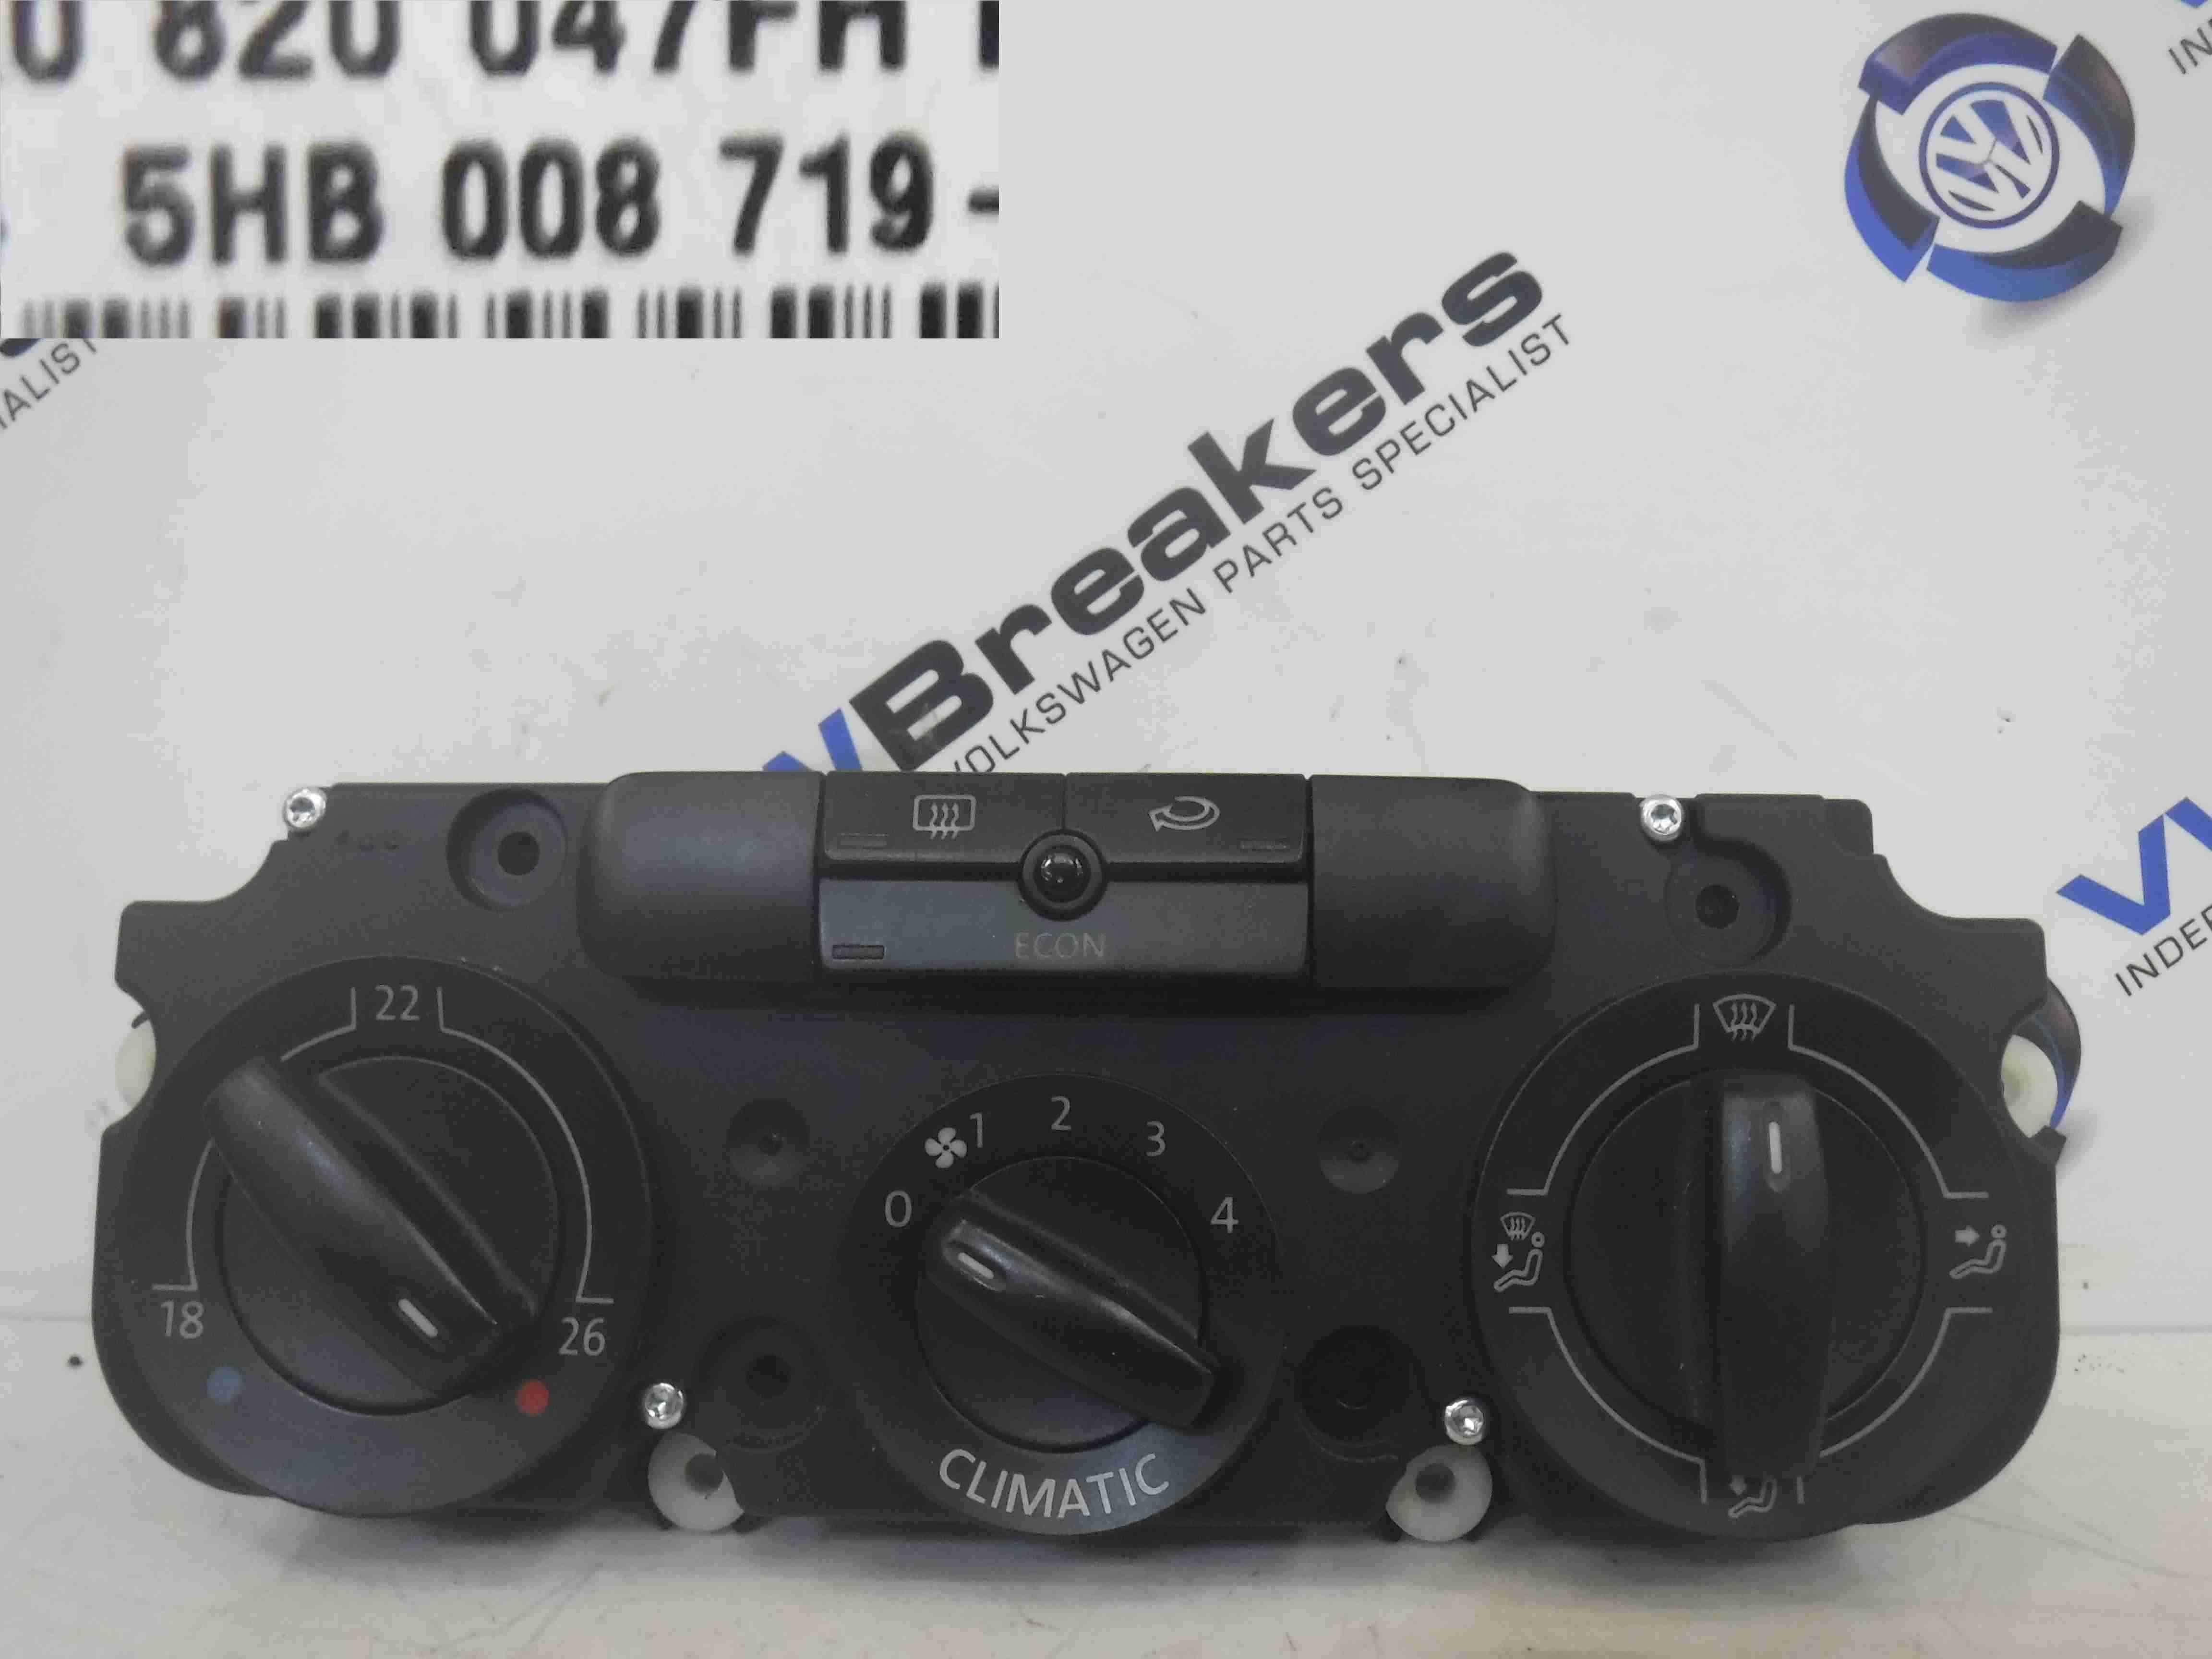 Volkswagen Jetta A5 2005-2011 Heater Control Dials Climate Aircon 5HB008719